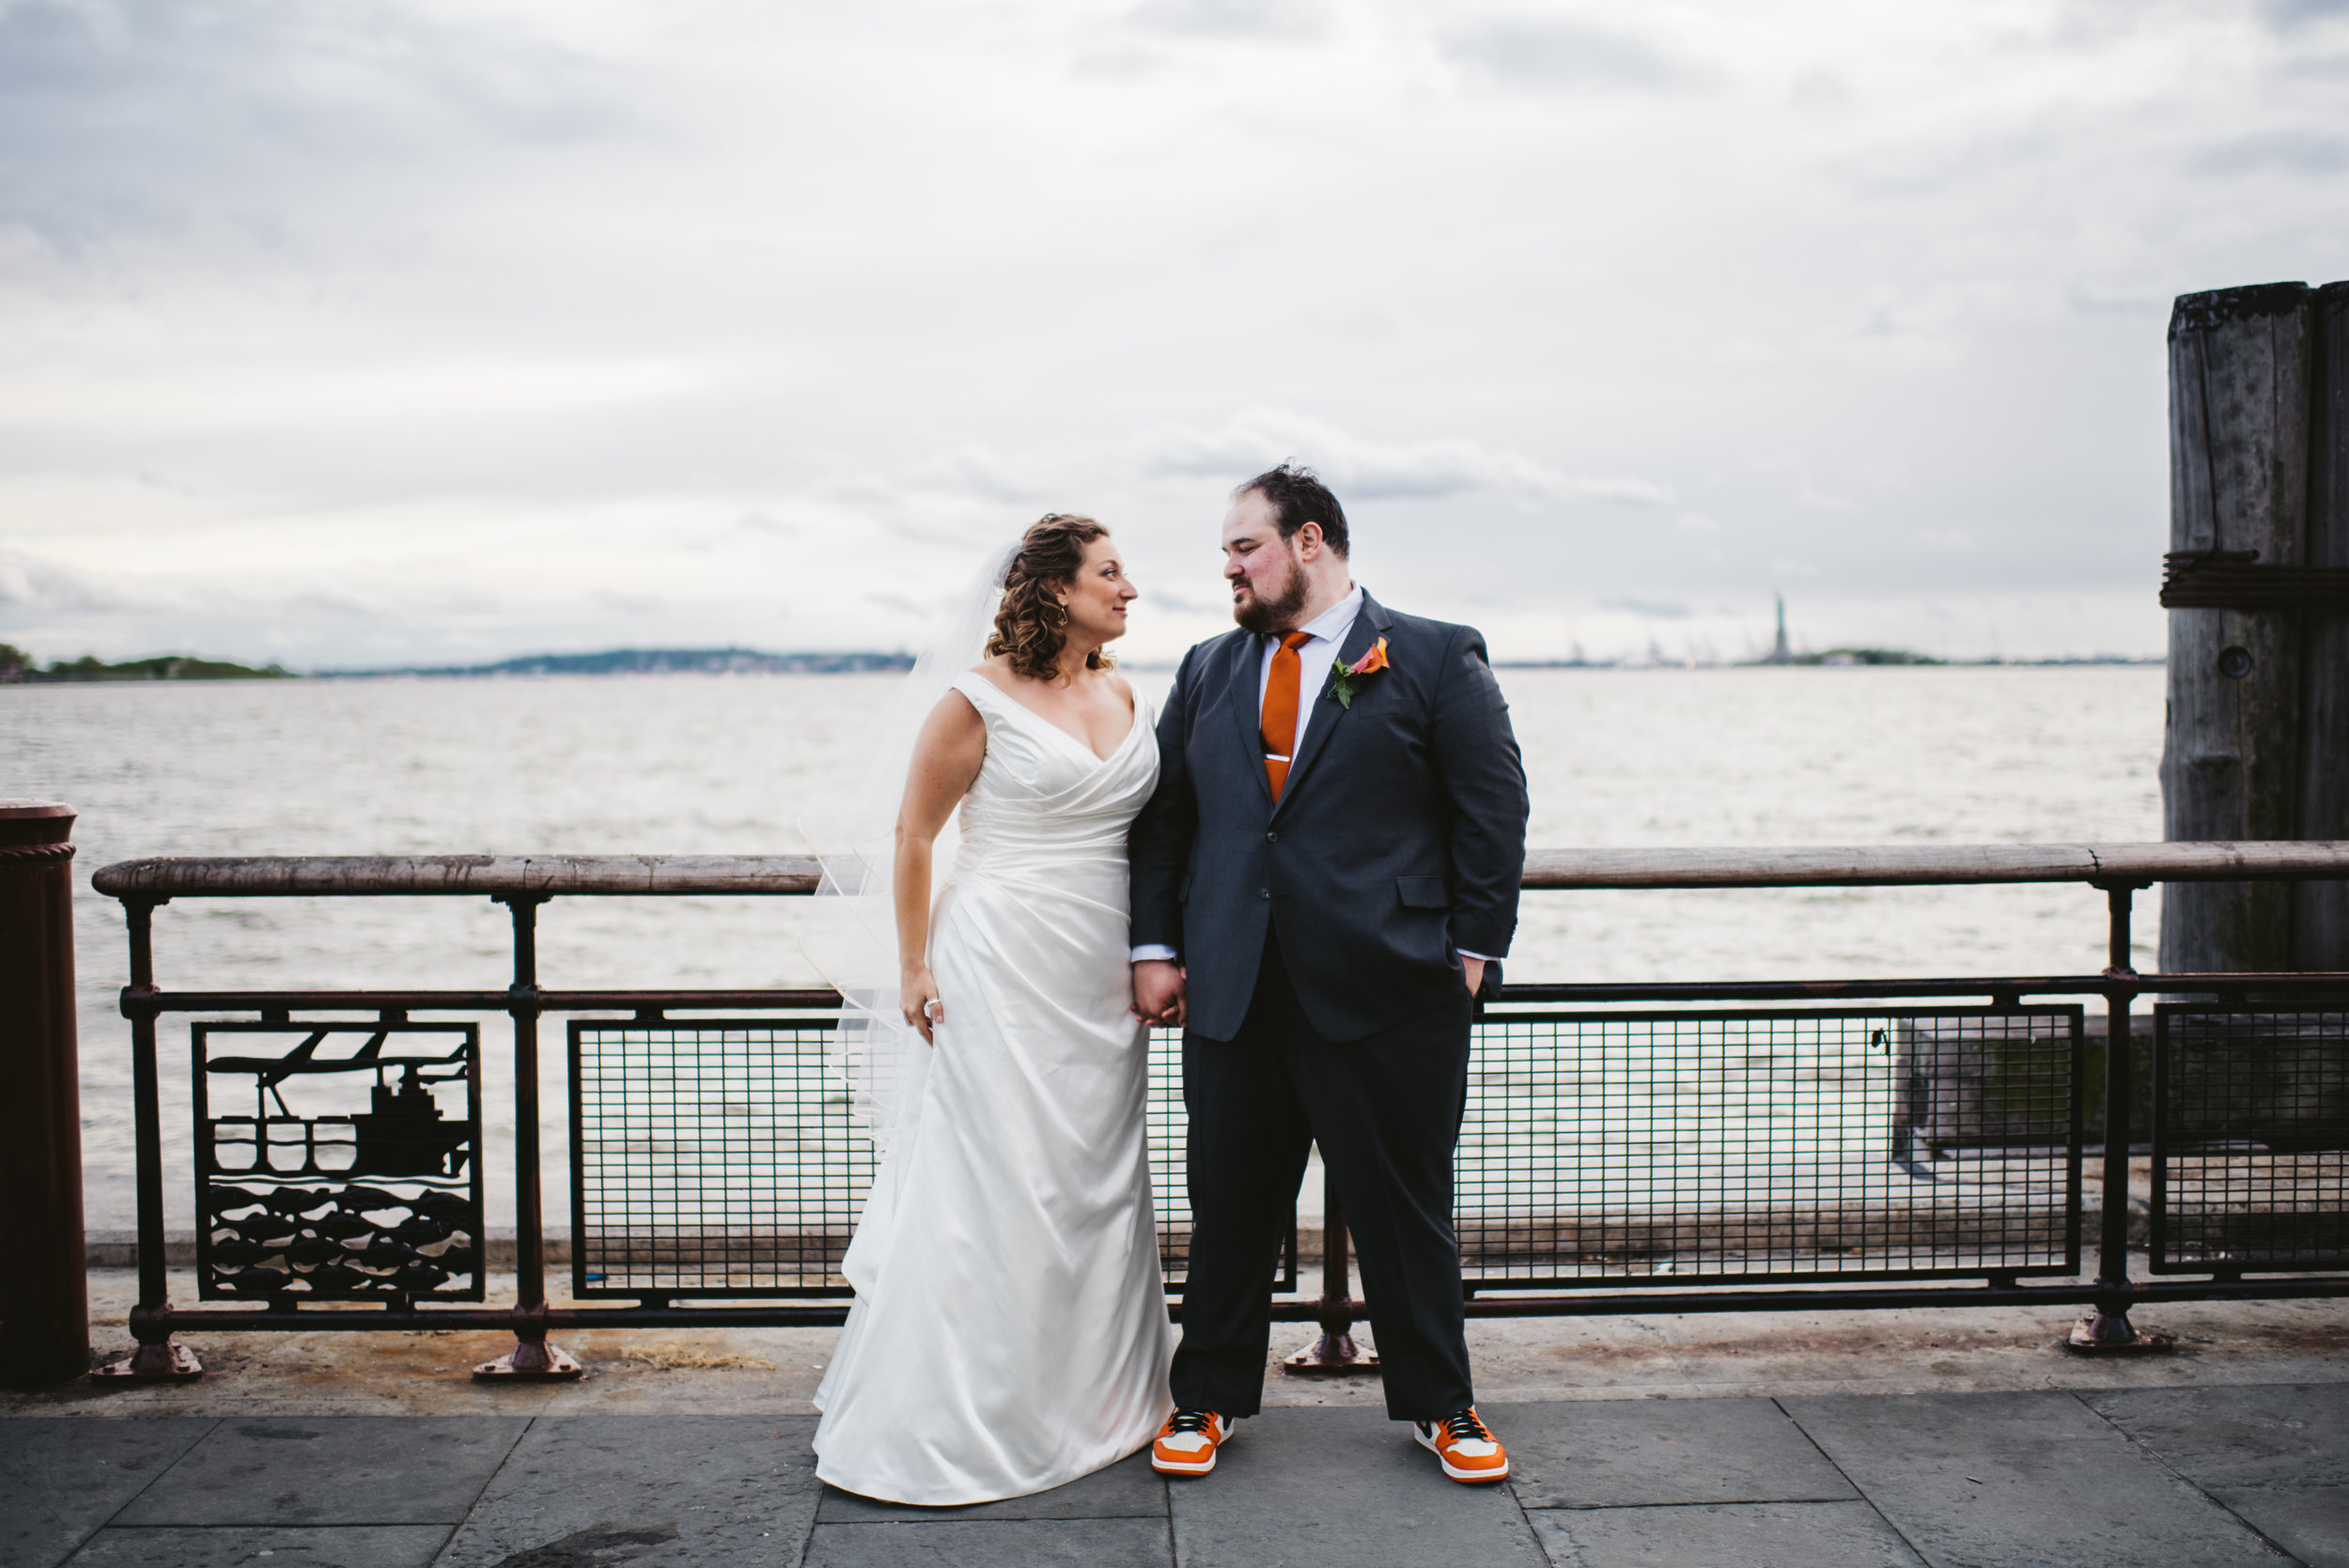 LIZA & JON - BATTERY PARK WEDDING - NYC INTIMATE WEDDING PHOTOGRAPHER - CHI-CHI AGBIM-558.jpg